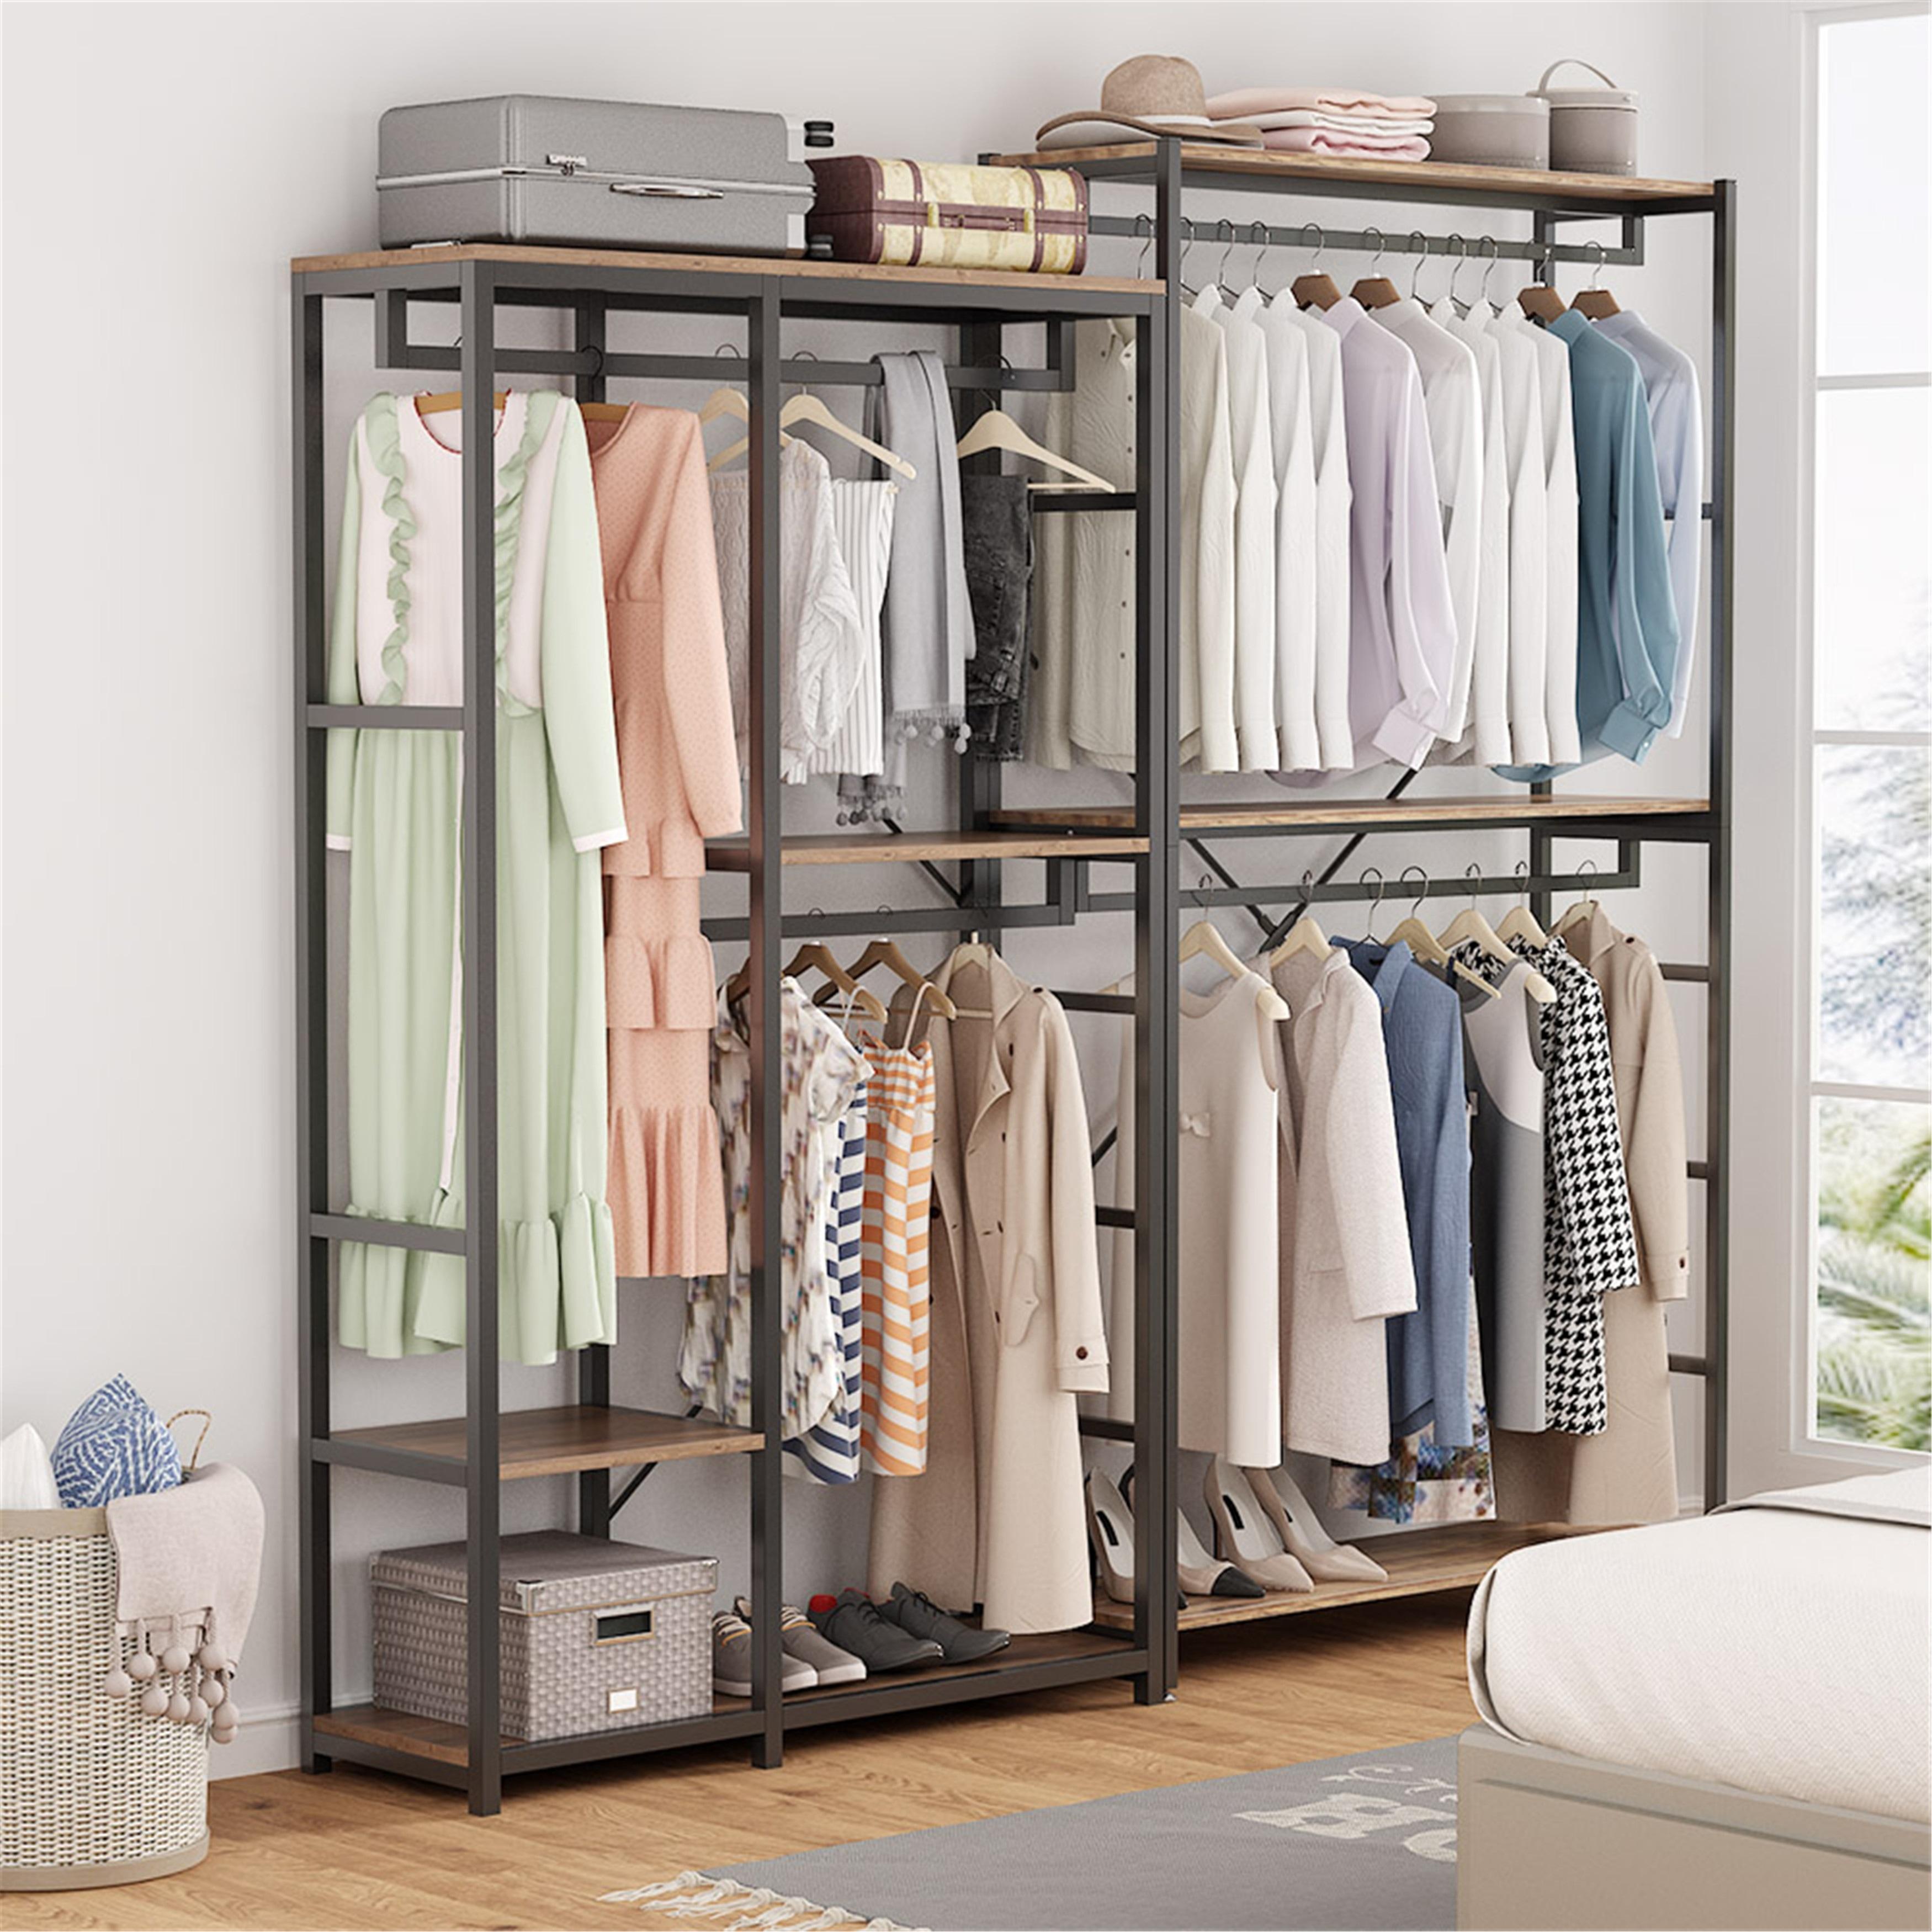 Shop Black Friday Deals On Double Rod Closet Organizer Clothes Garment Rack Brown Overstock 31433987